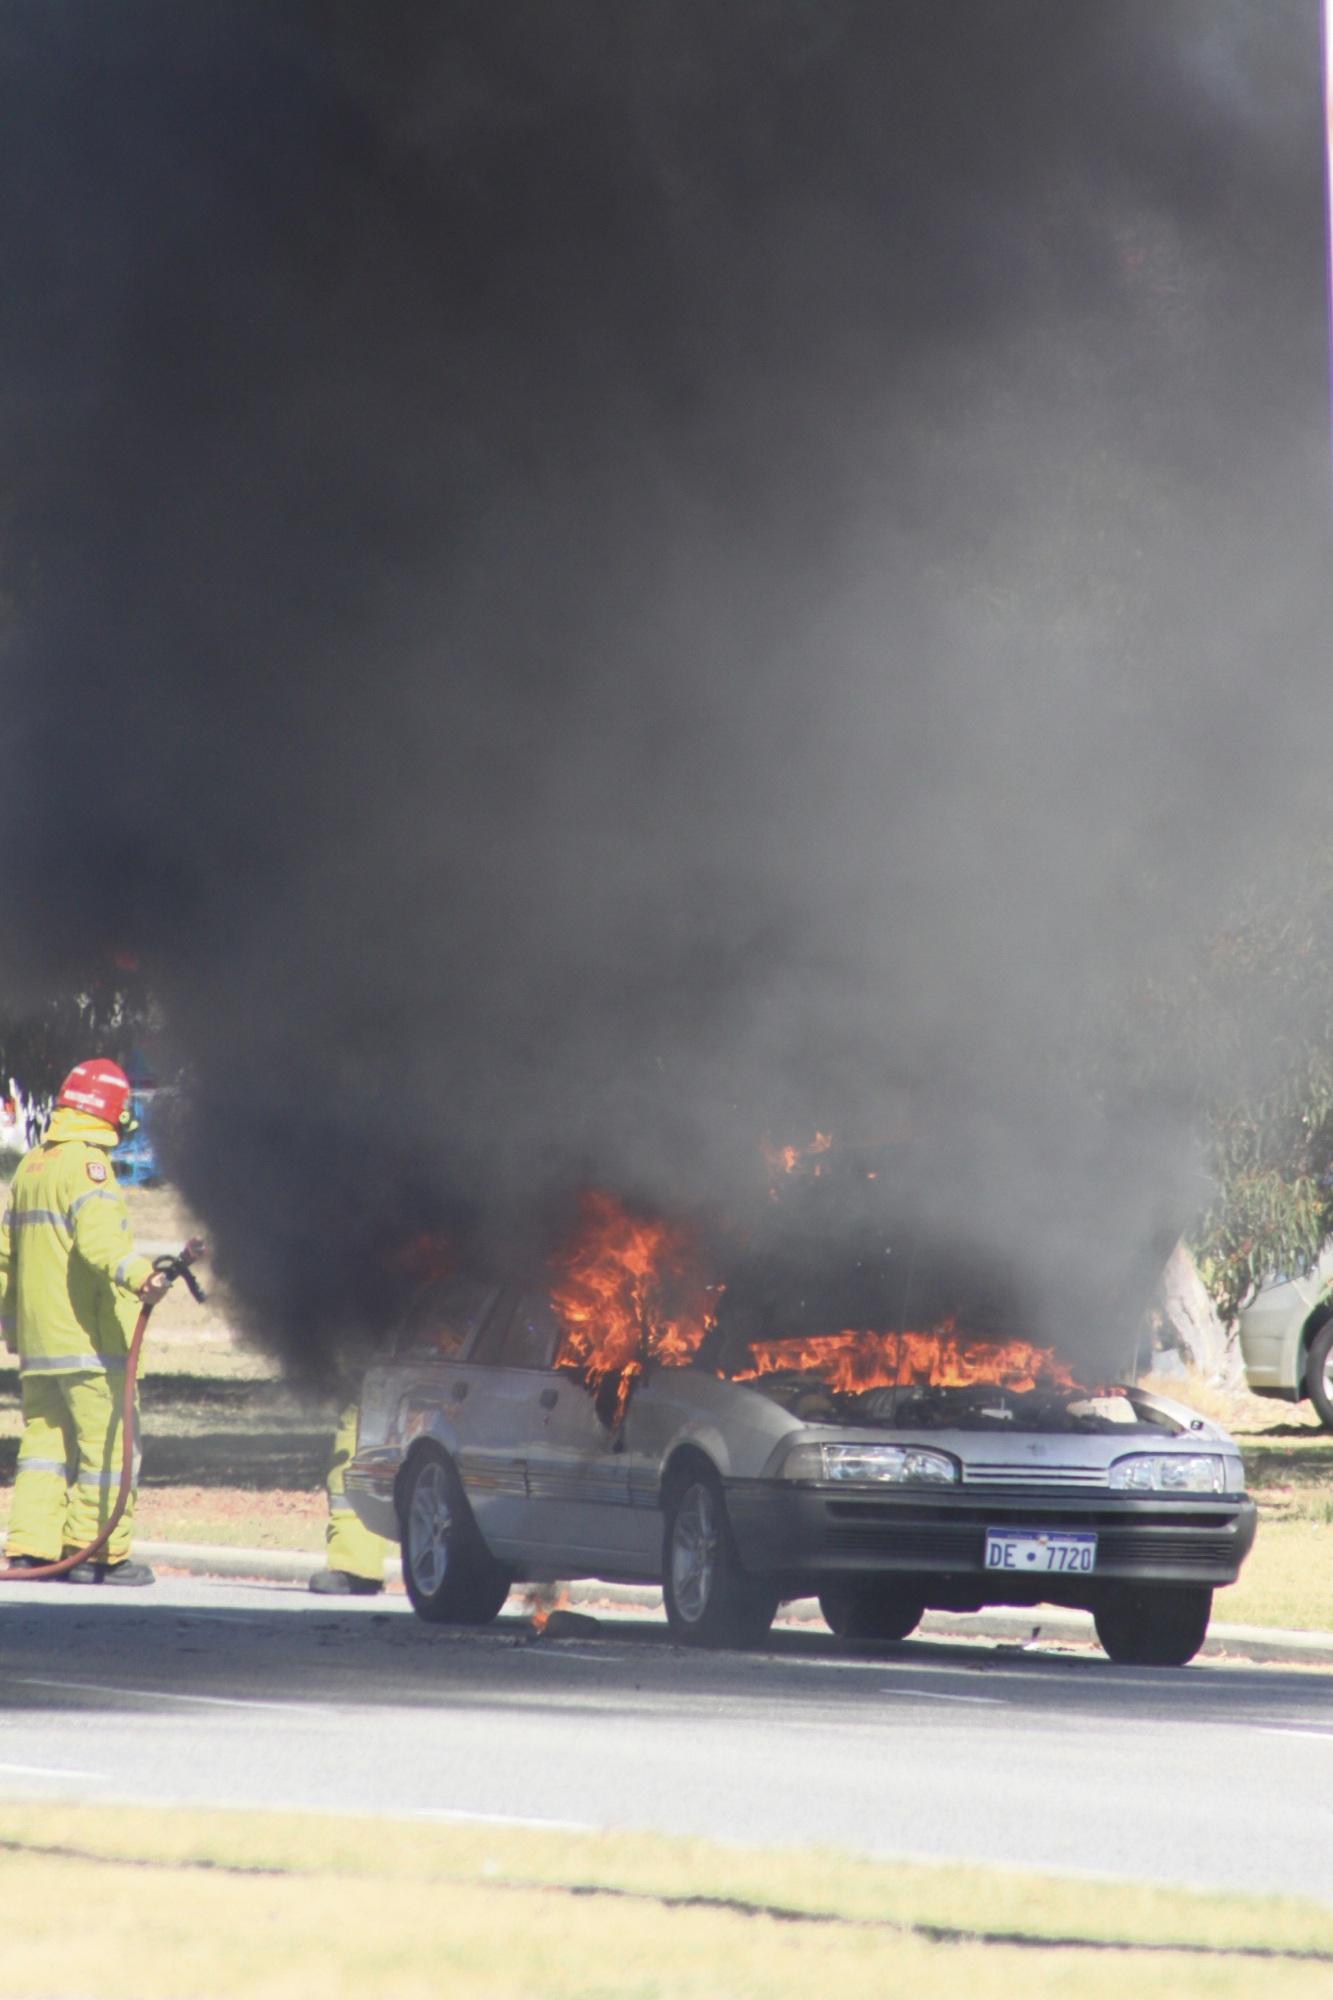 Rockingham motorist has lucky escape after car bursts into flames